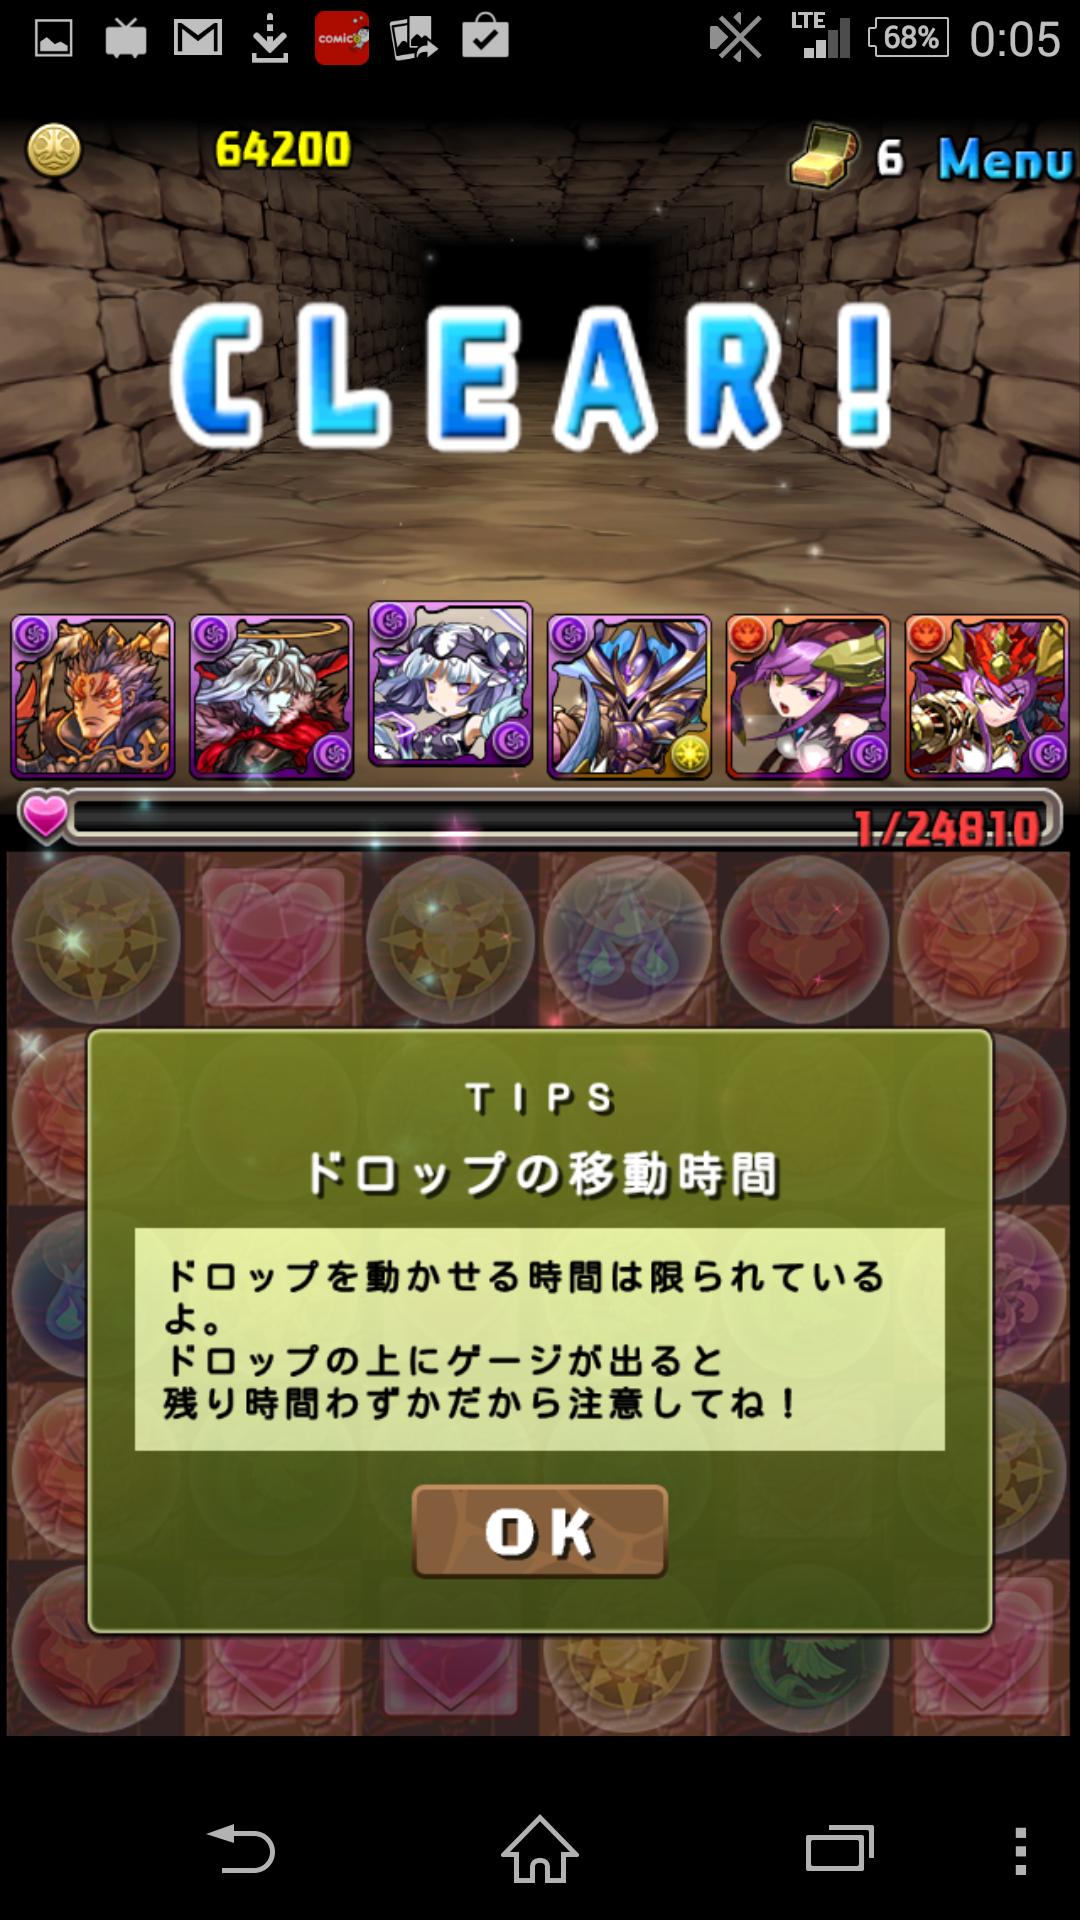 Screenshot_2014-10-22-00-05-16.png